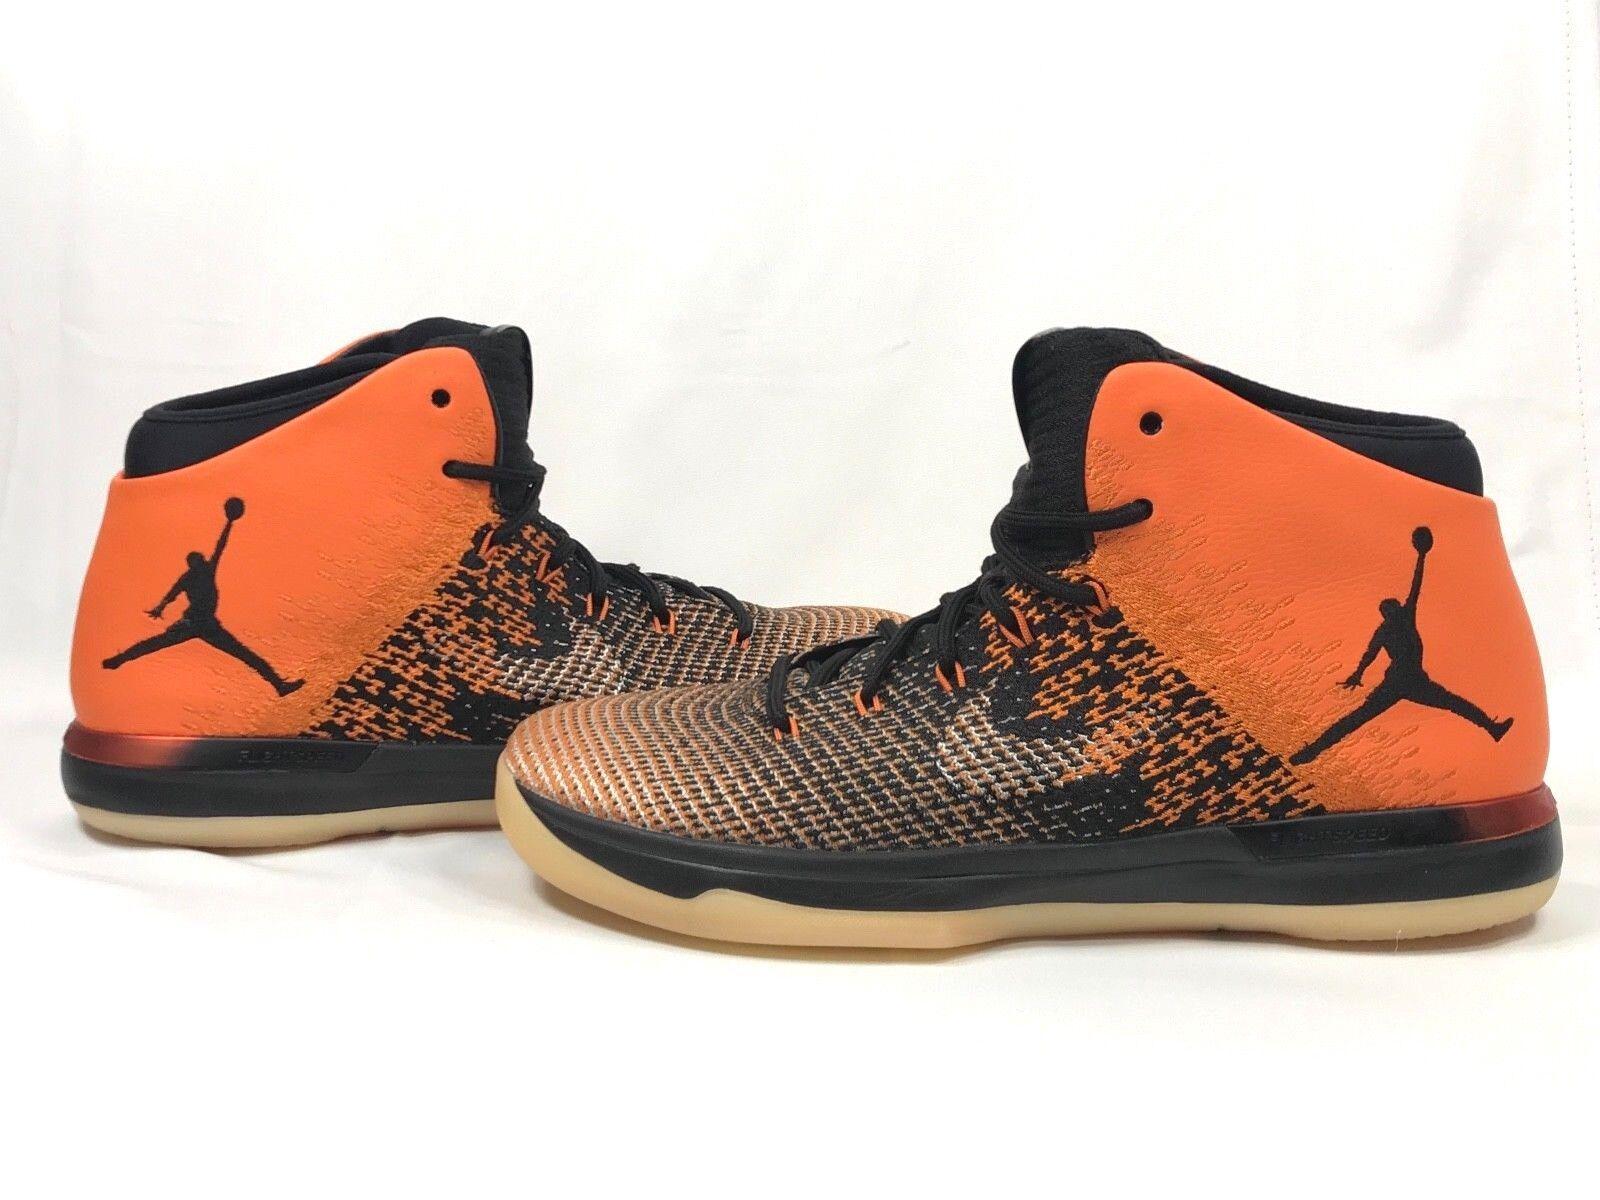 Nike Air Jordan XXXI 31 Black Starfish Shattered Backboard Size 10